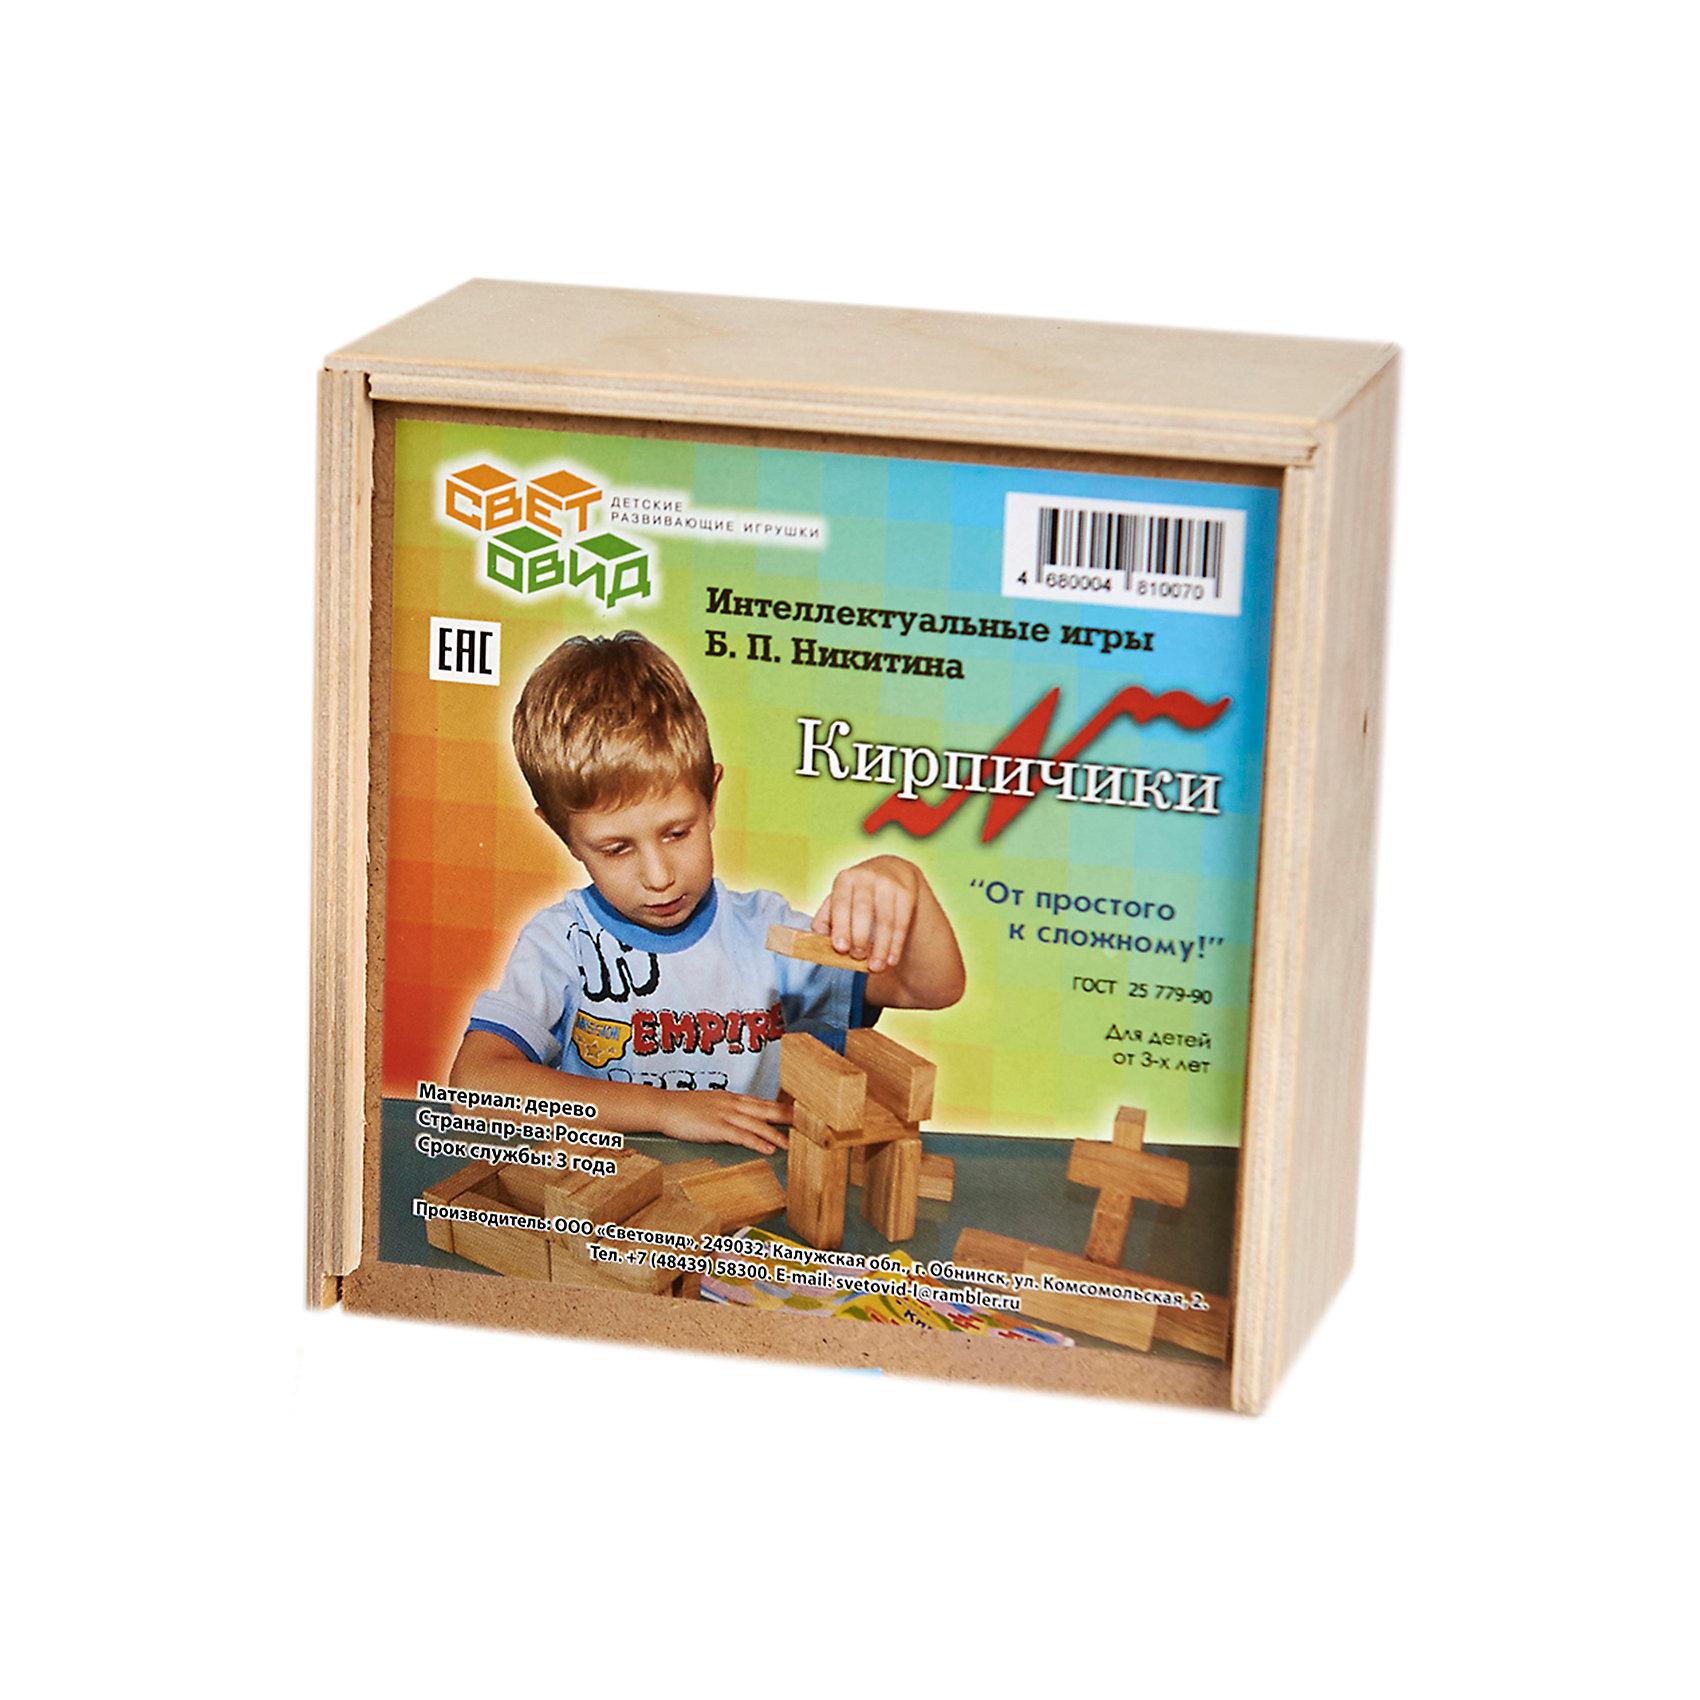 Кирпичики, (коробка фанера), Световид от myToys